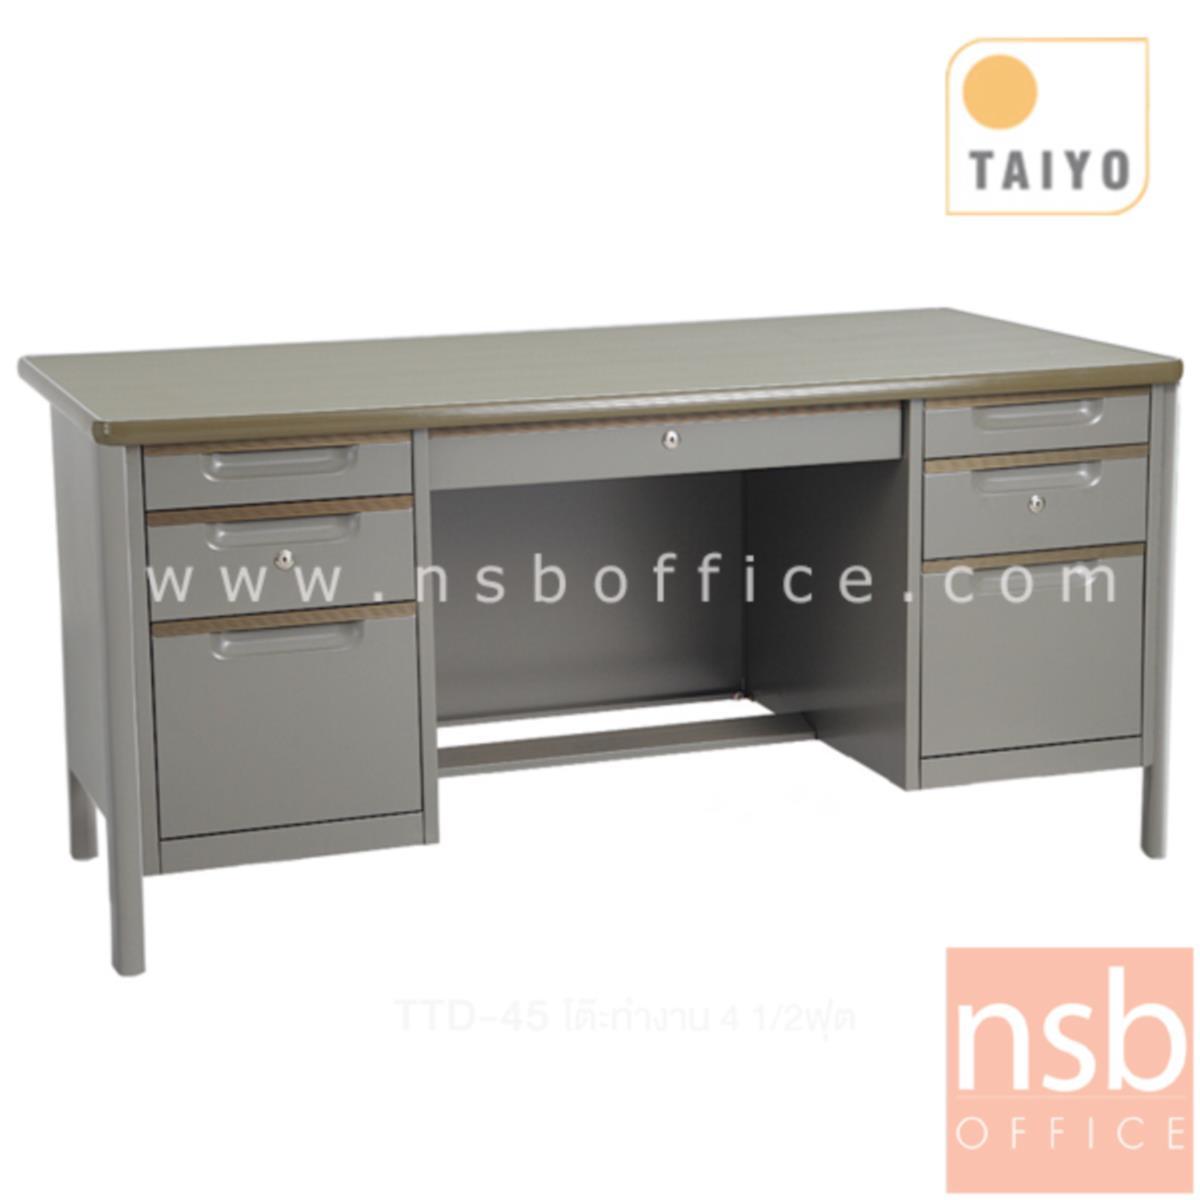 E02A047:โต๊ะทำงาน 7 ลิ้นชักขากล่อง  รุ่น TTDD ขนาด 4.5 ,5 ฟุต มือจับอลูมิเนียมพร้อมกุญแจล็อค